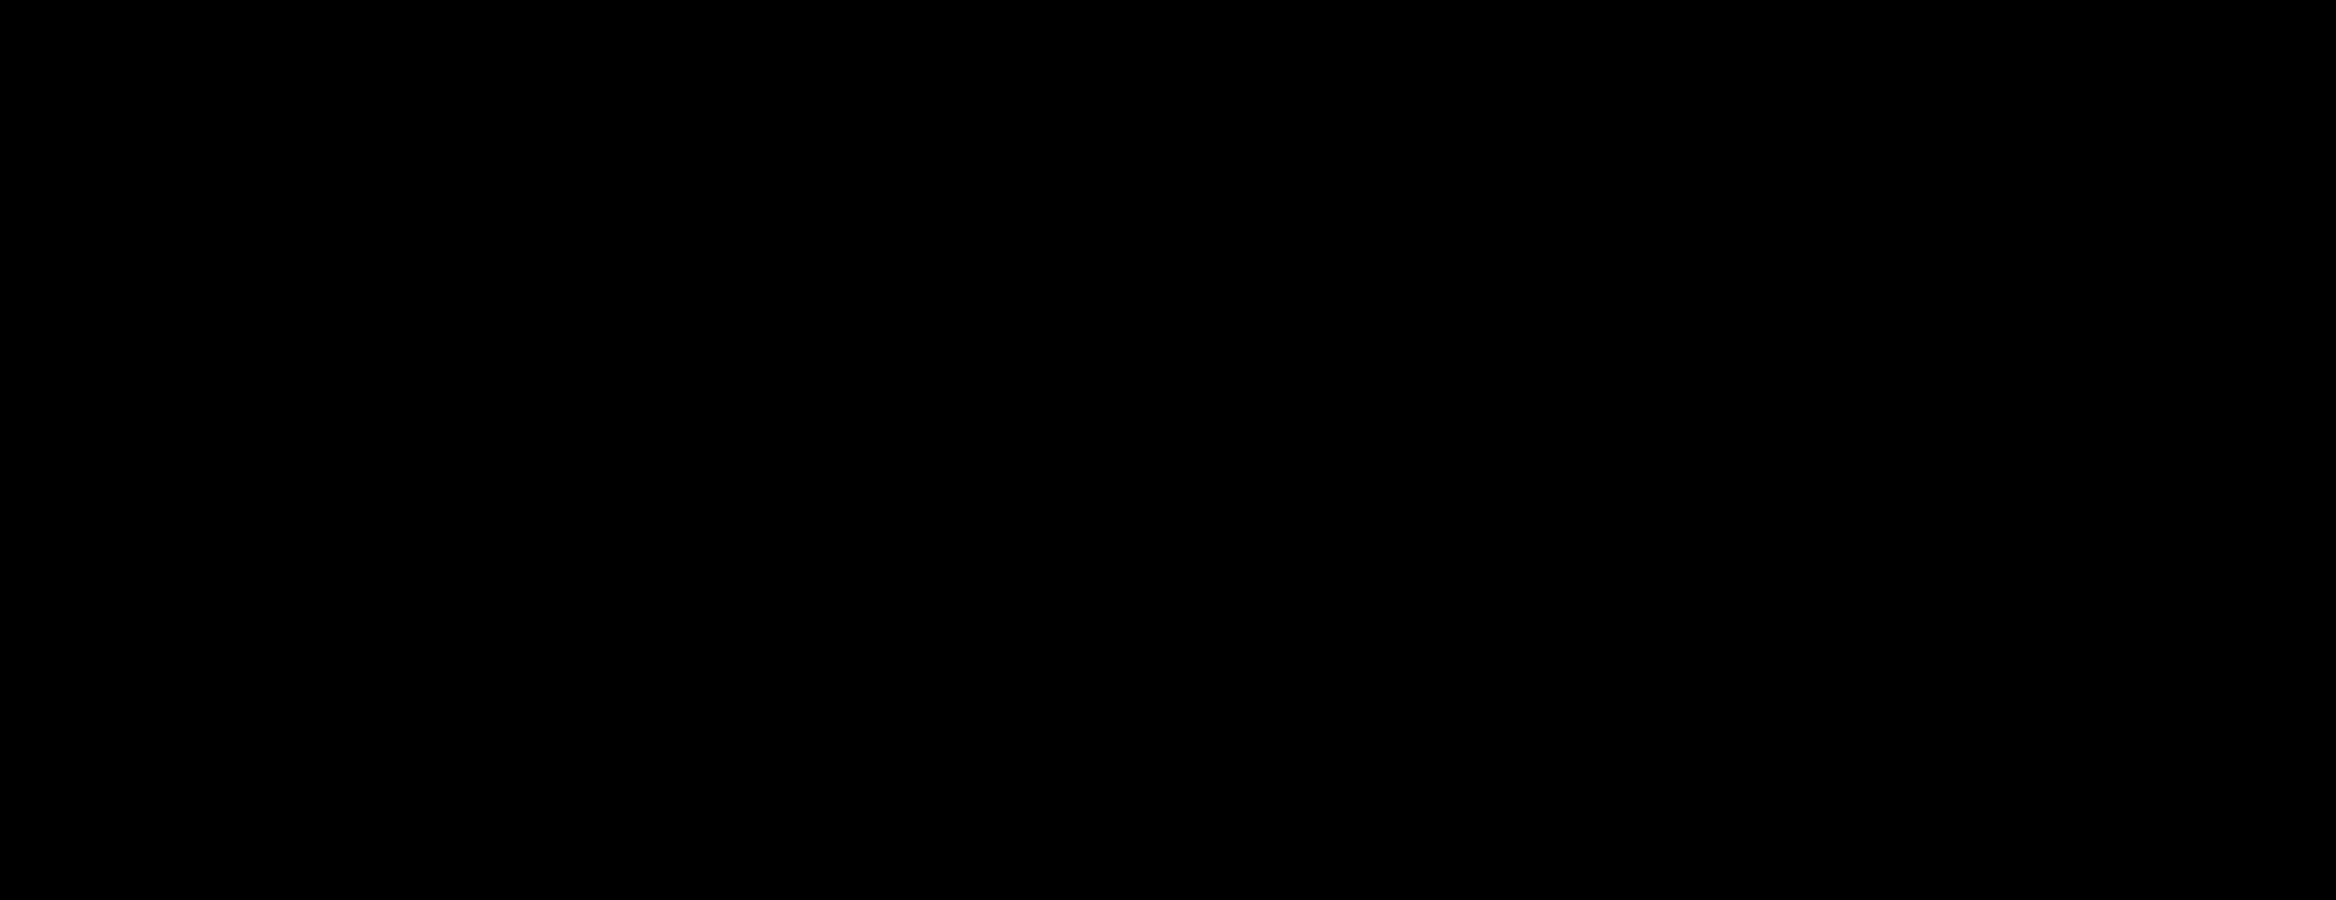 Fosstopp